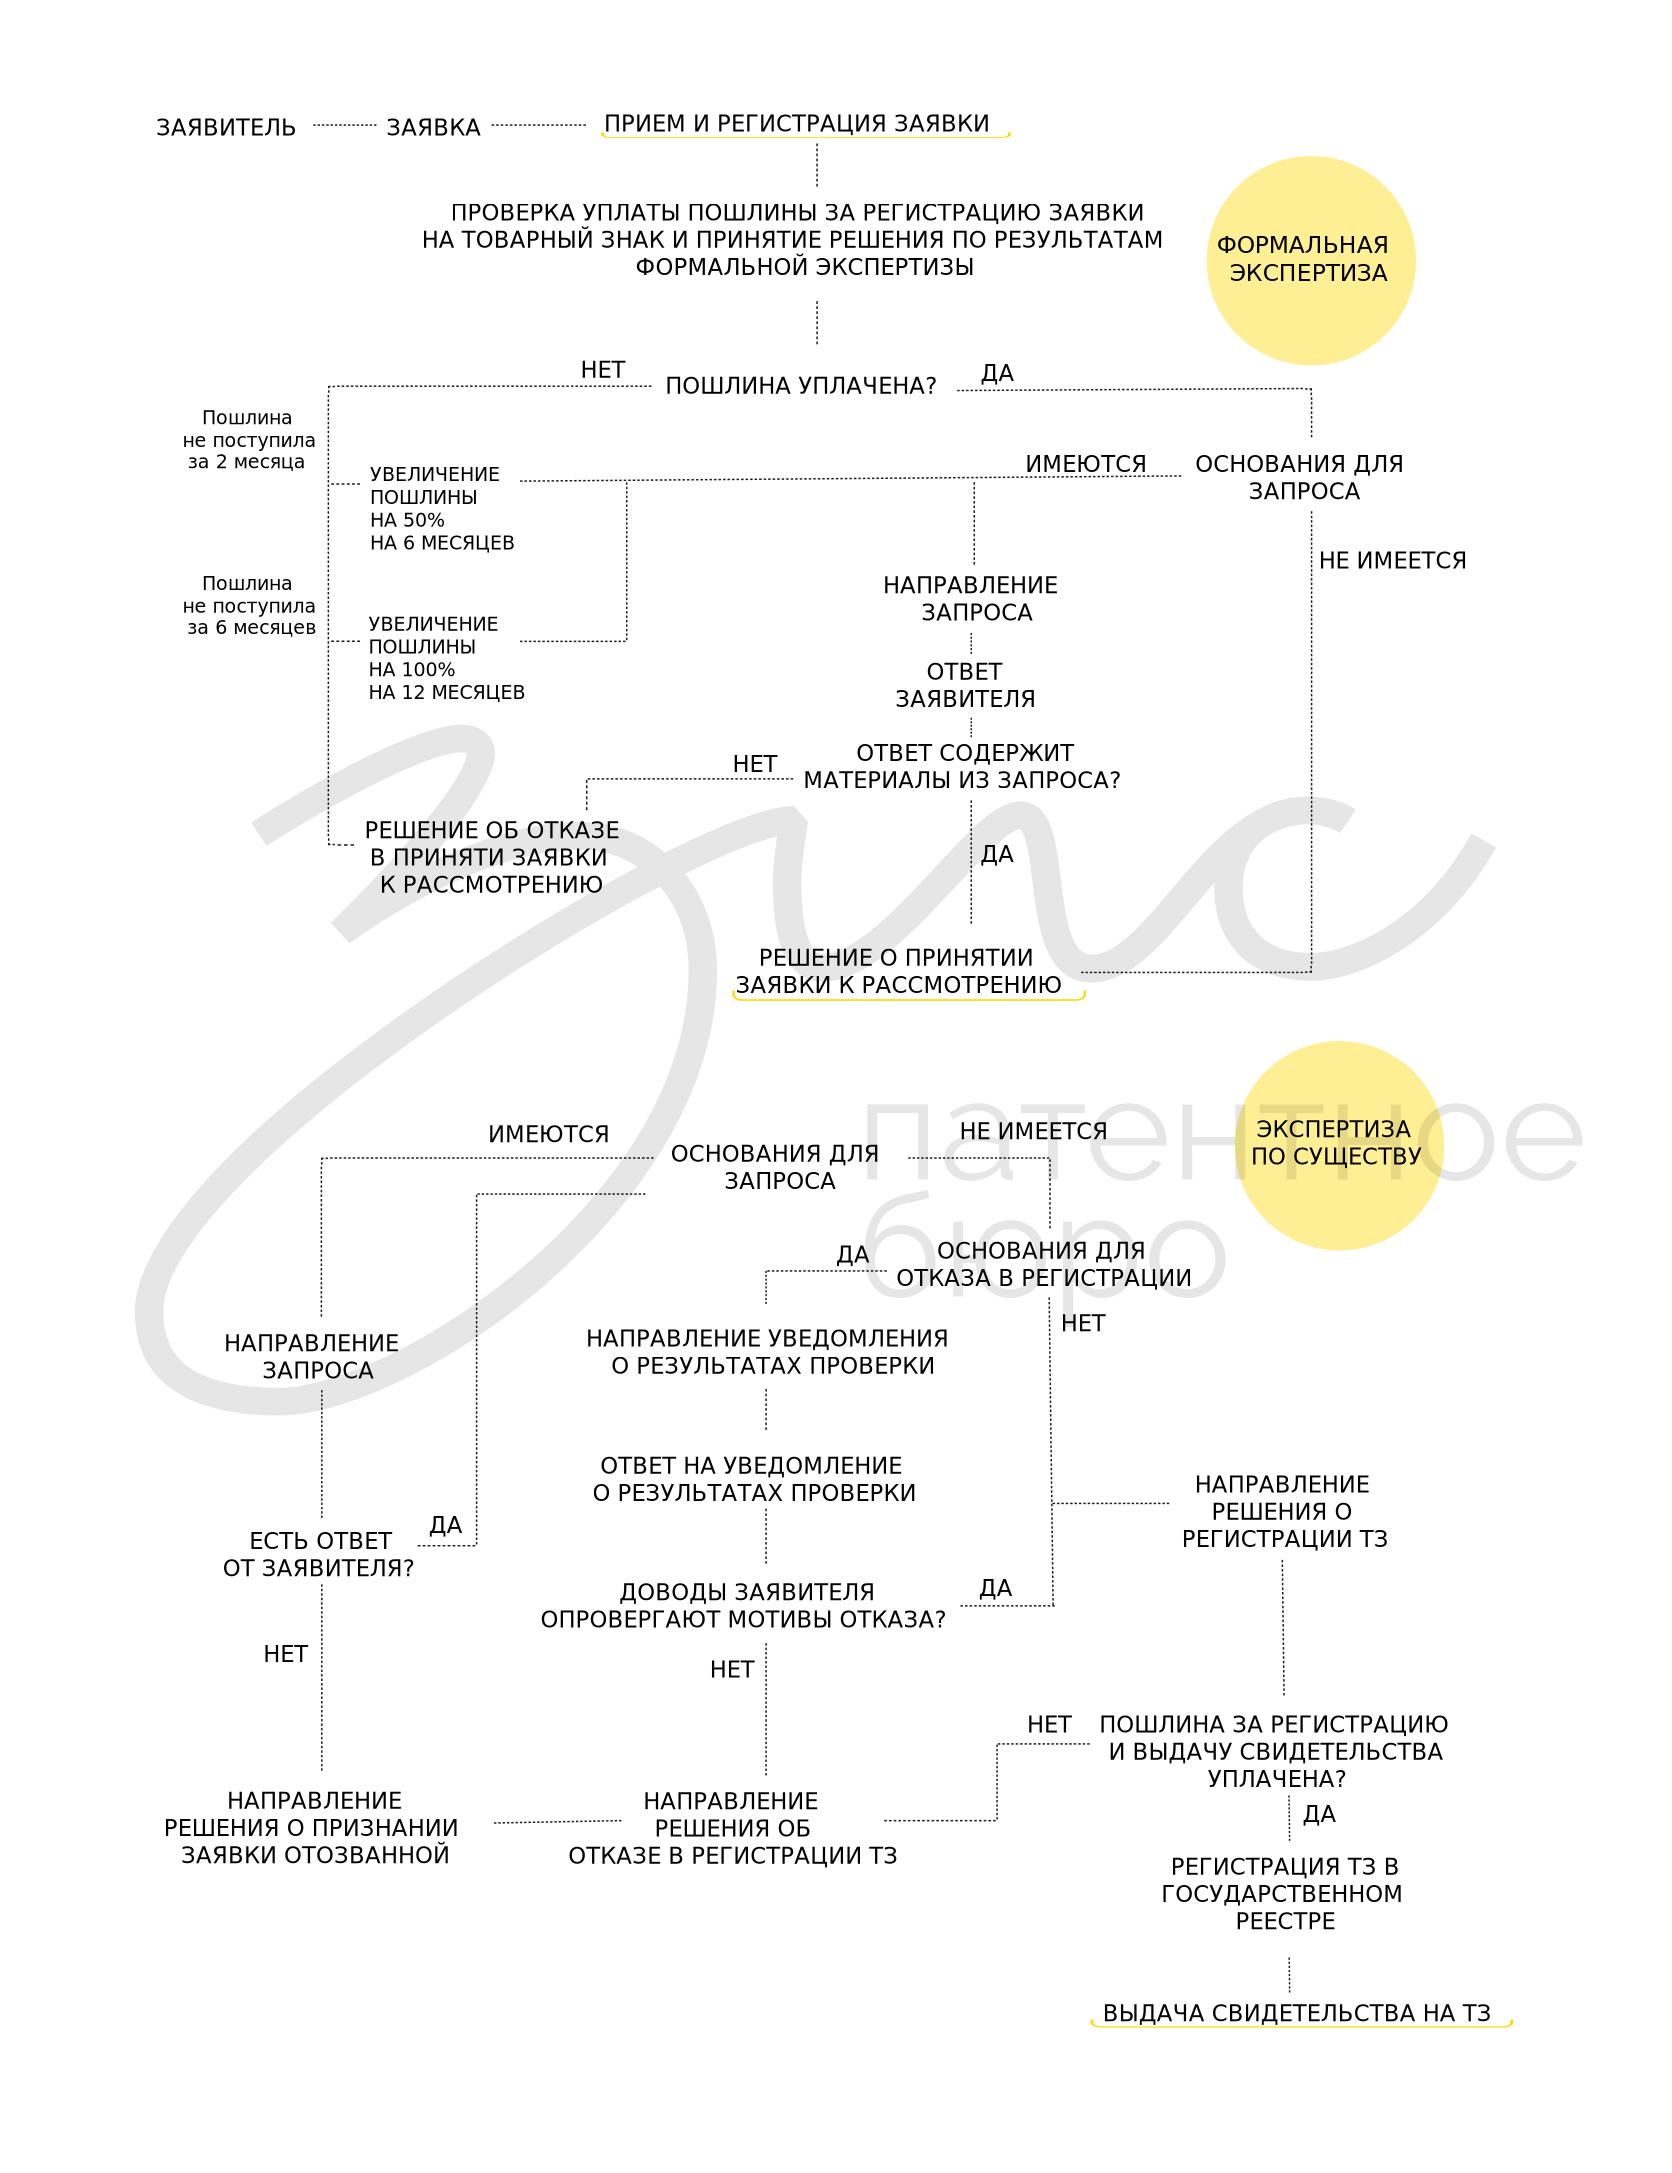 Алгоритм процесса регистрации товарного знака в Роспатенте